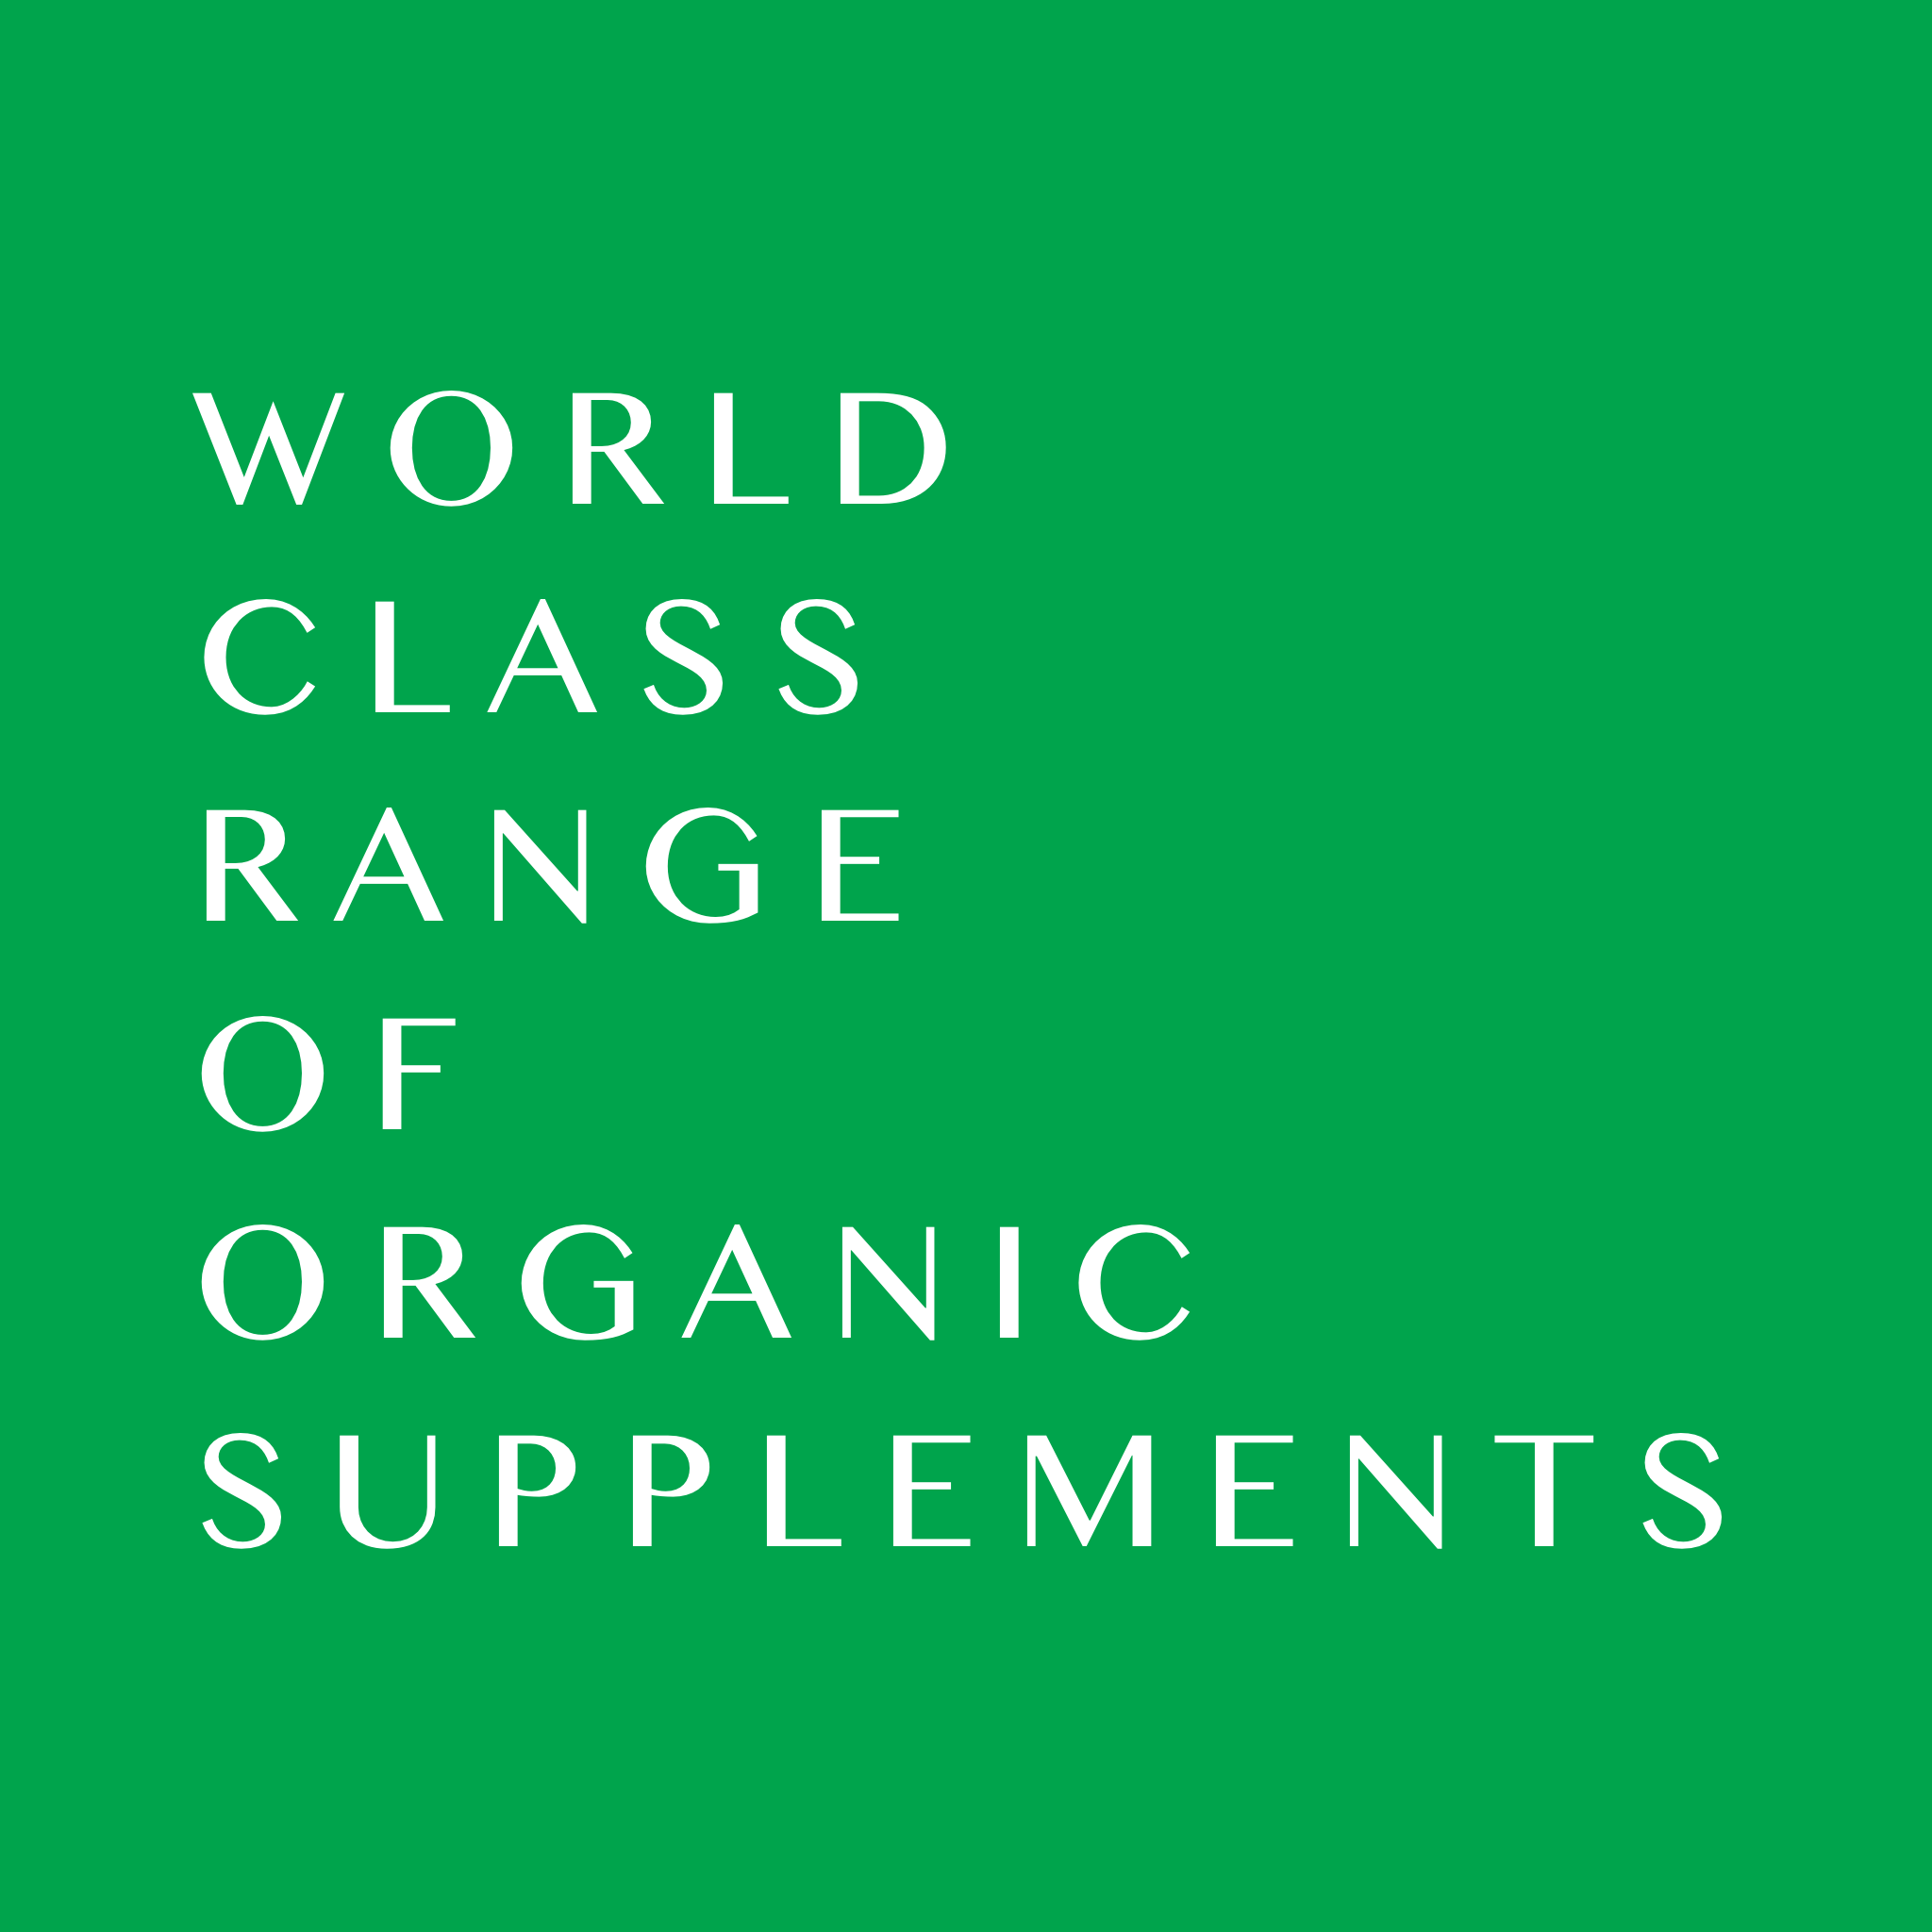 World Class range of organic supplements